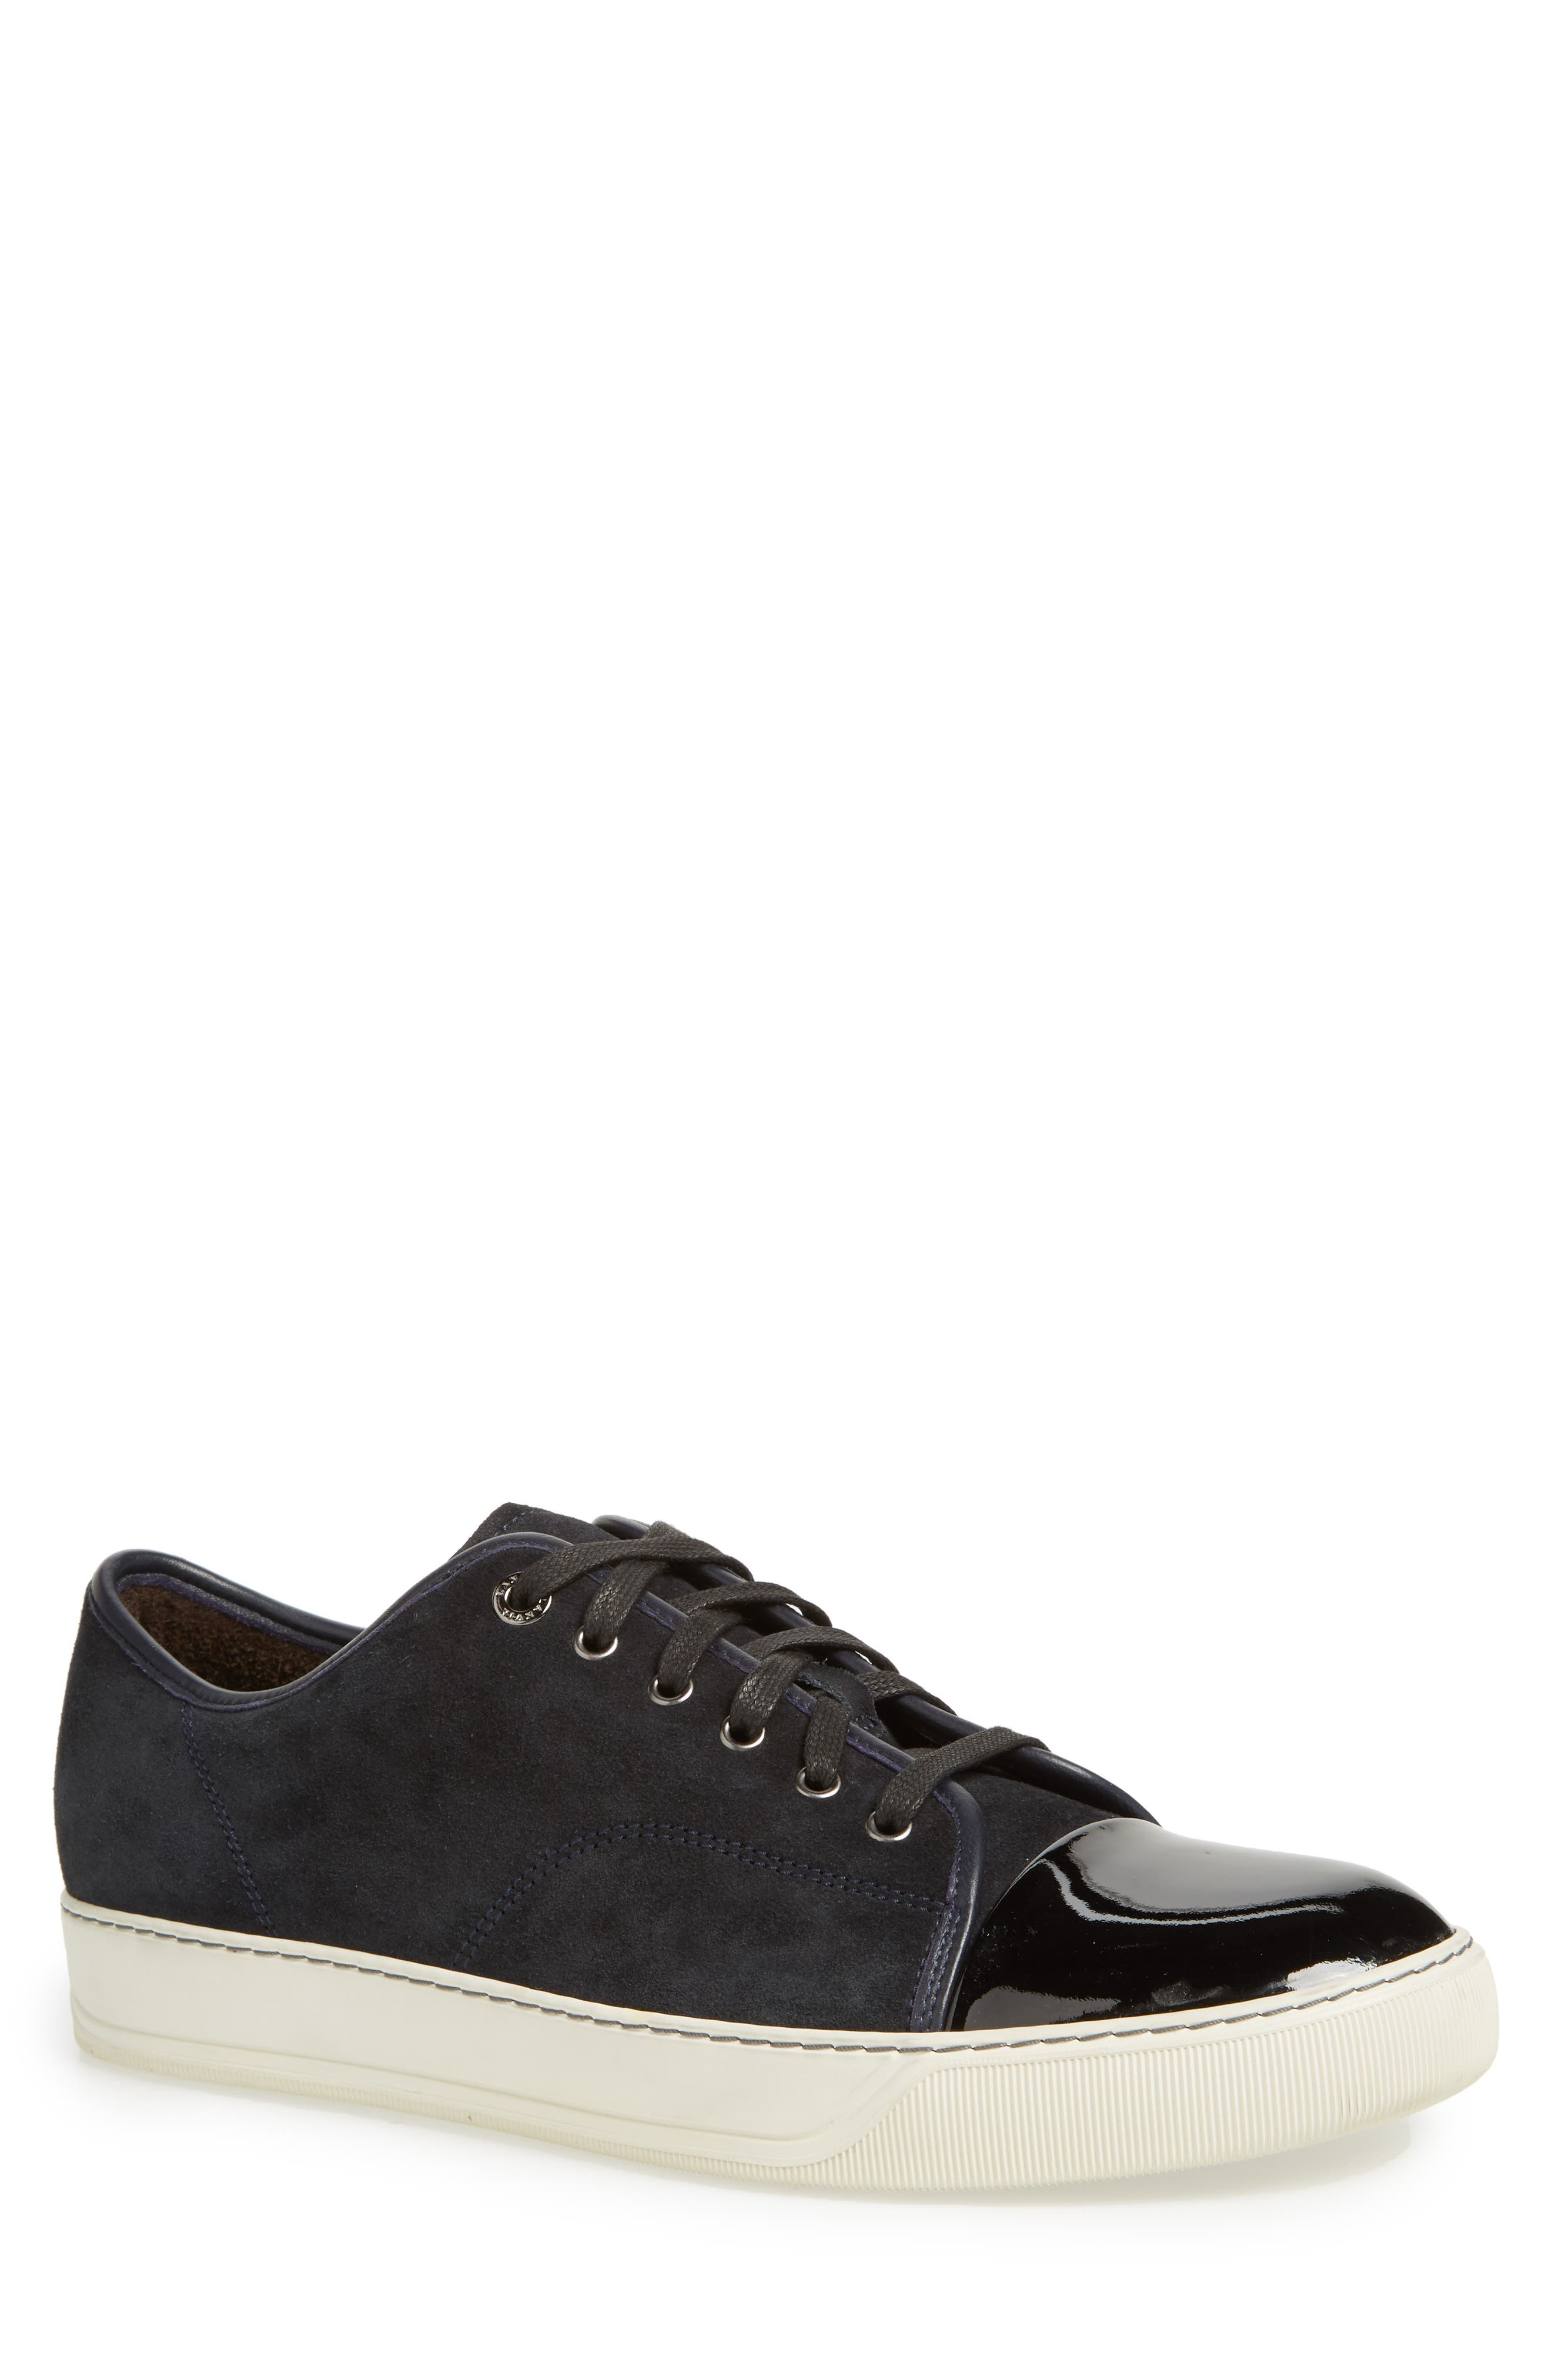 Low Top Suede Sneaker,                             Main thumbnail 1, color,                             024